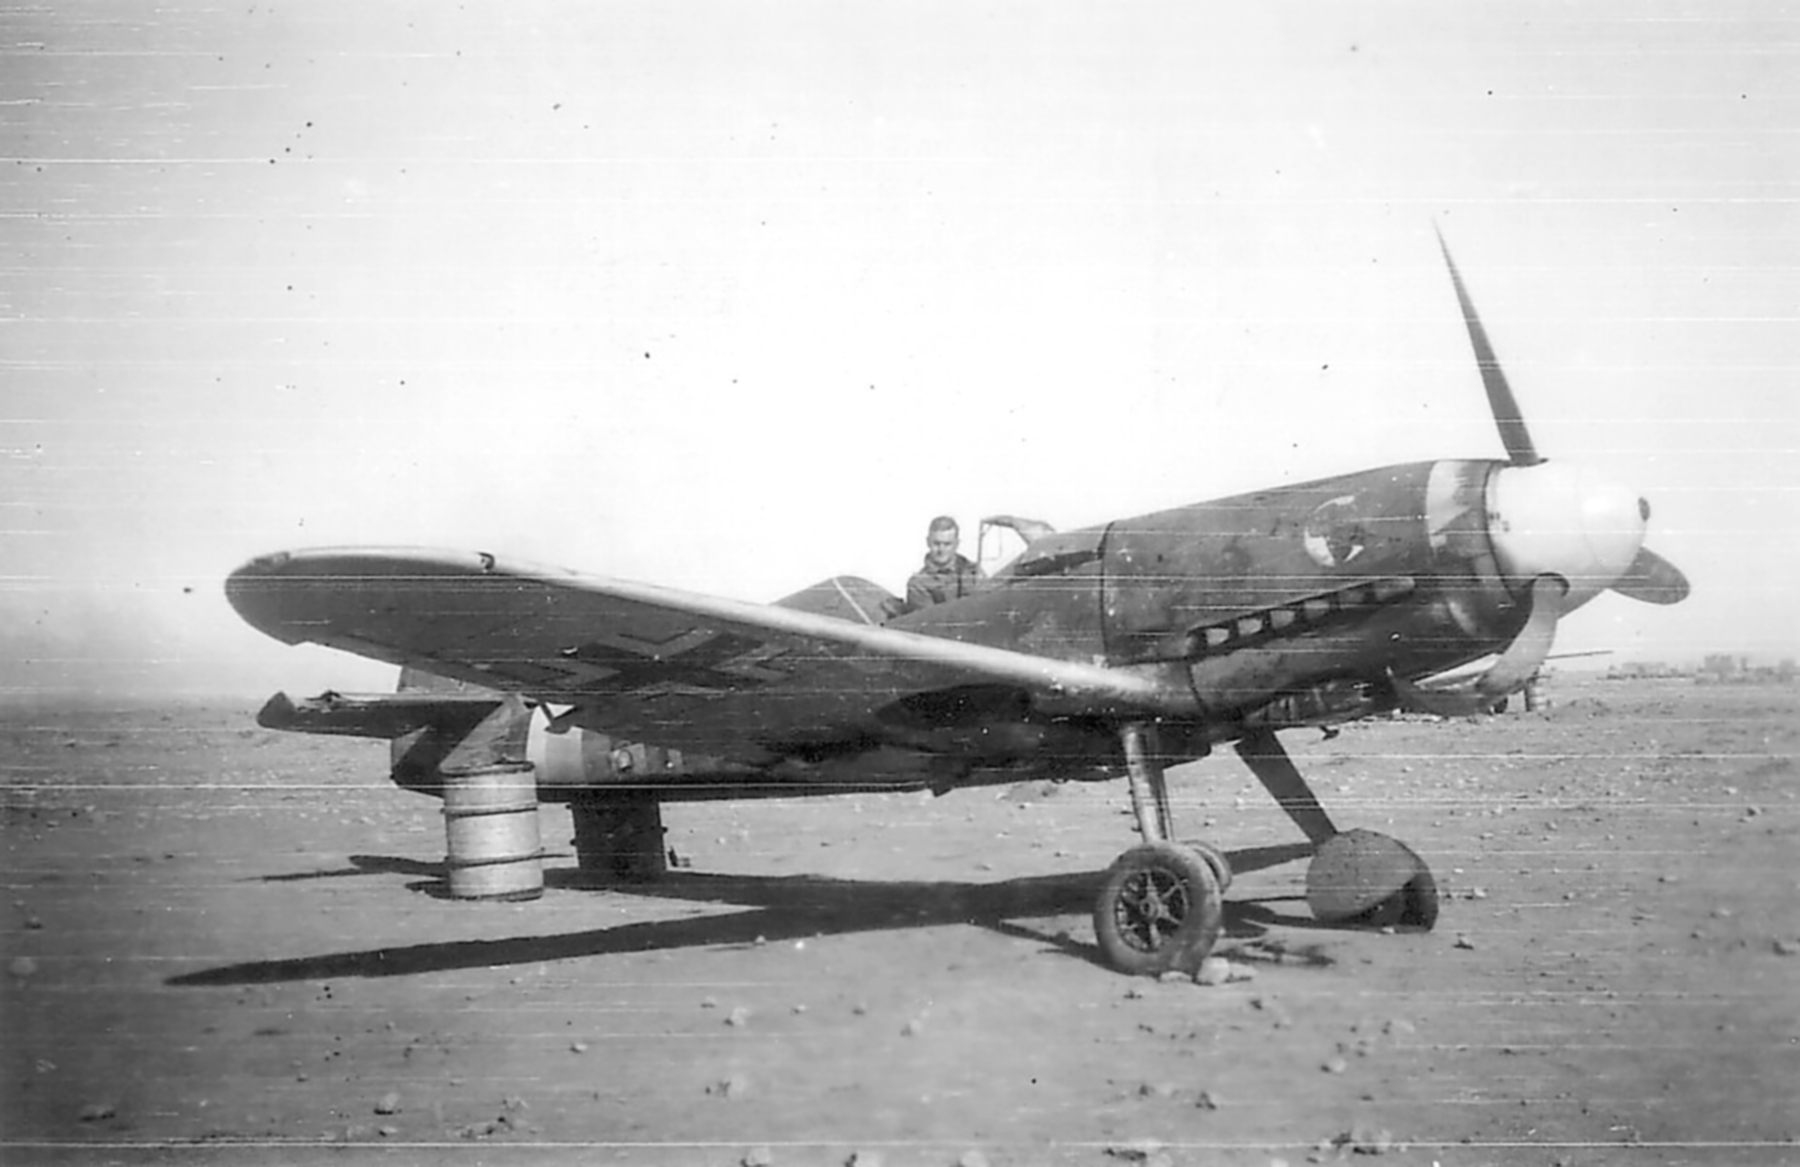 Messerschmitt Bf 109F4Trop 1.JG27 White 5 Albert Espenlaub crash landed El Adem Dec 1941 04